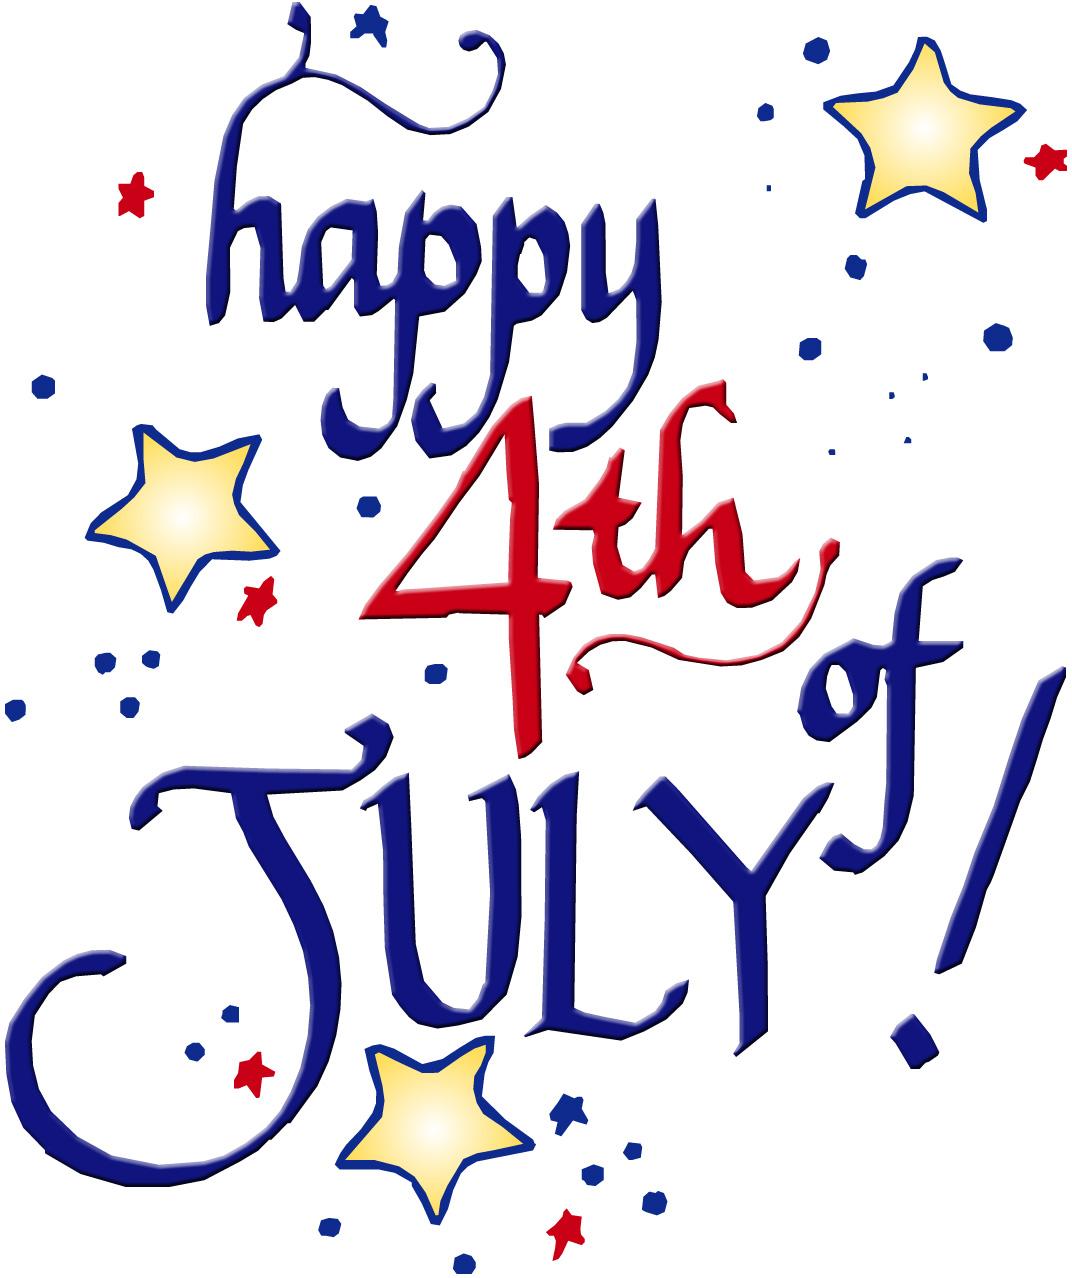 http://1.bp.blogspot.com/-gmStldom7ro/T_RaTNiKYoI/AAAAAAAABIU/kkAiDJovs-E/s1600/DJI_Dazzle_July_happy4th_c.jpg